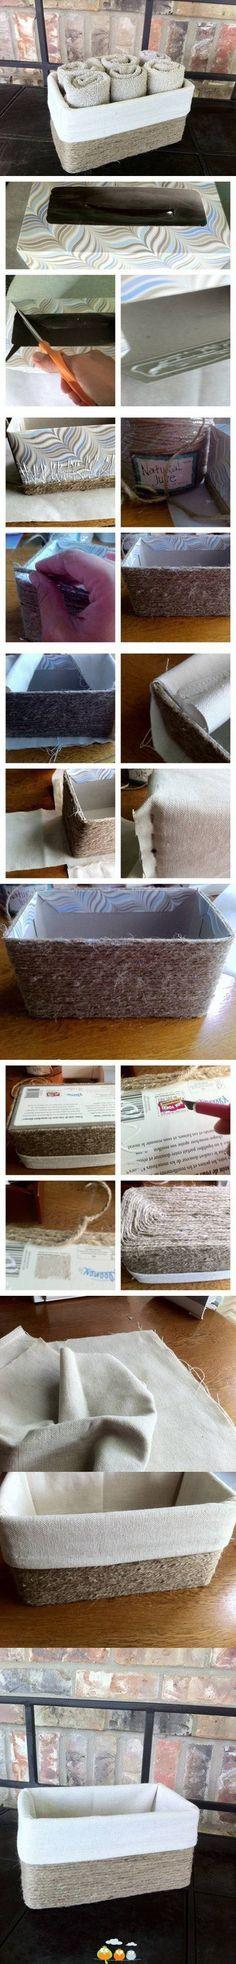 tissue box to decorative storage box